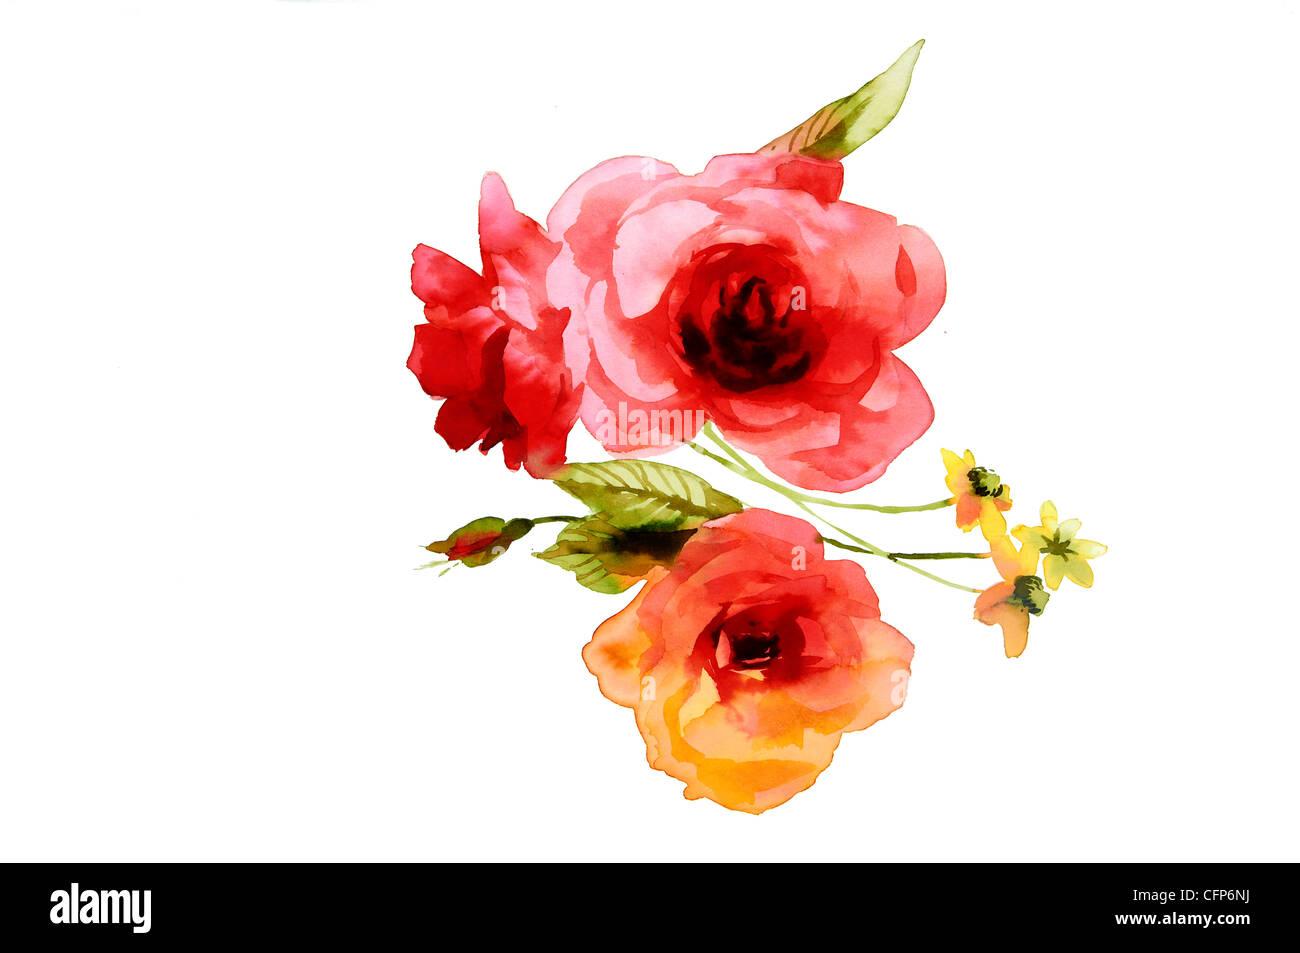 Watercolour Flowers Stock Photos & Watercolour Flowers Stock Images ...